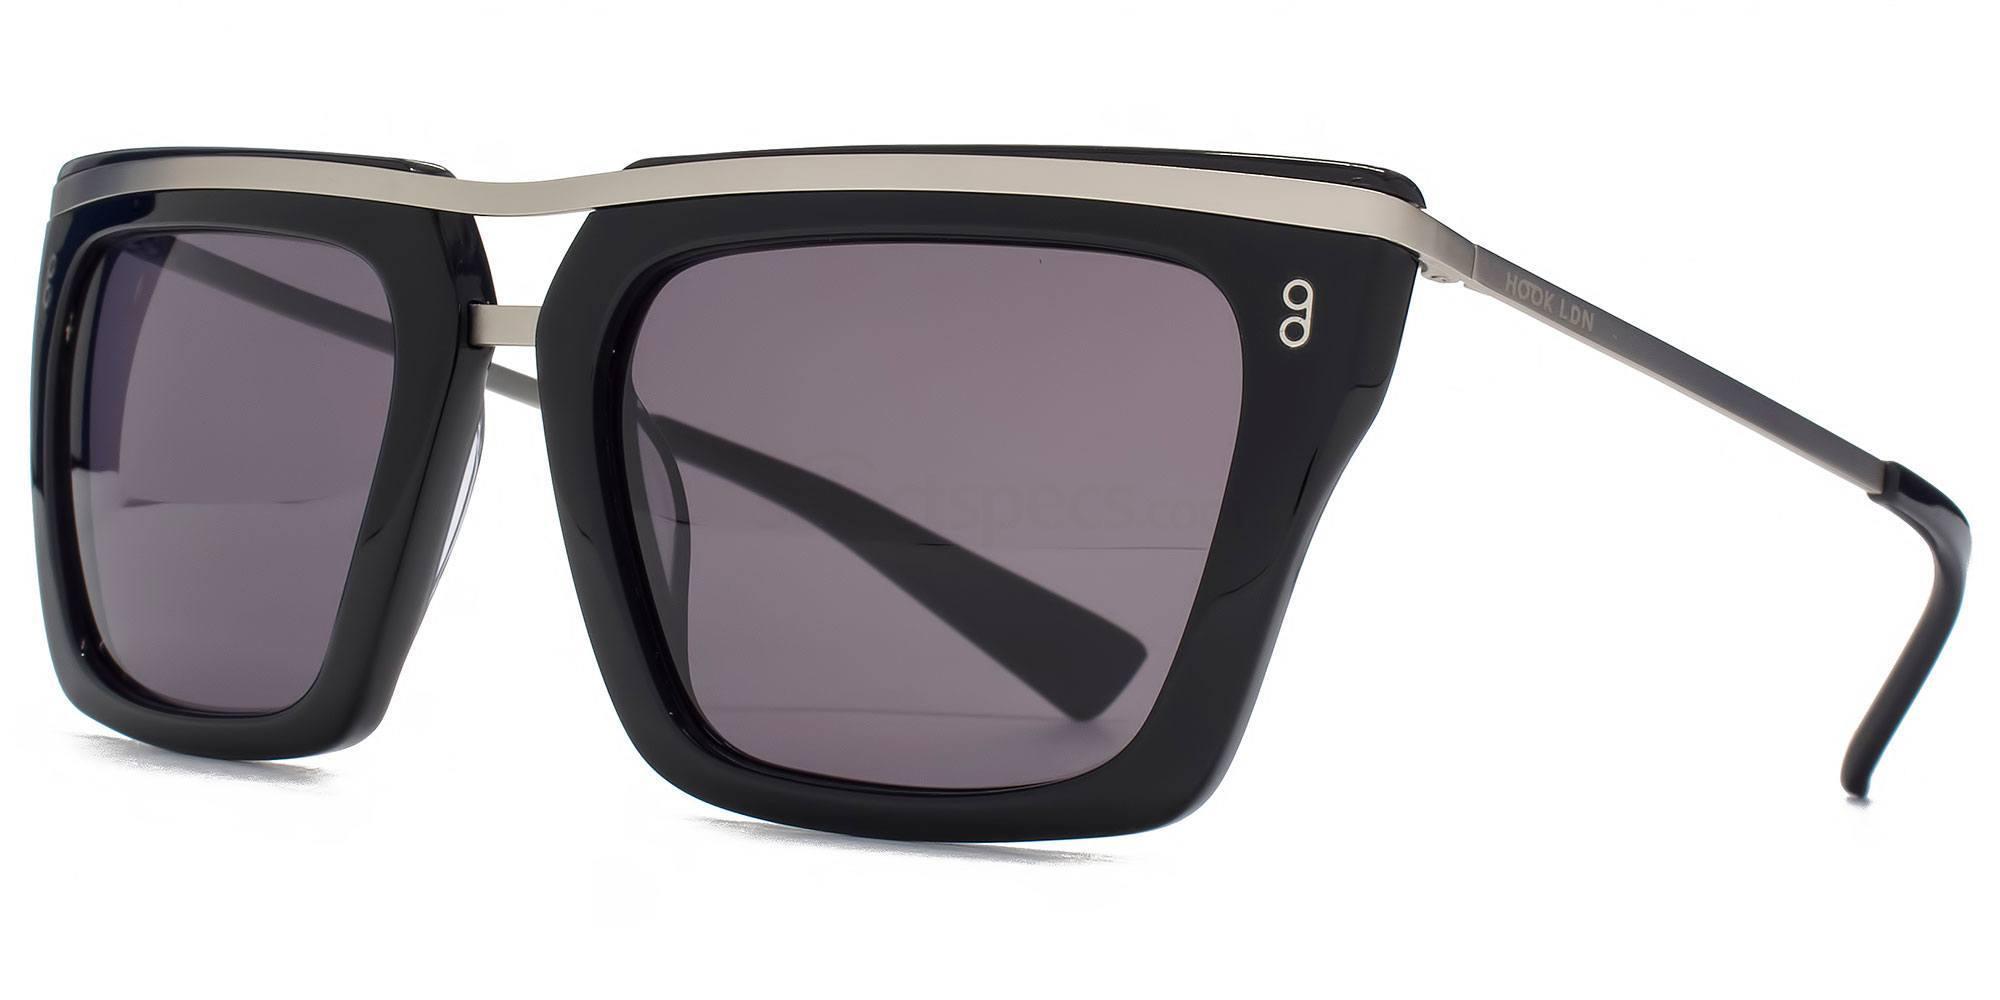 BLK HK011 - CHAMBERS Sunglasses, Hook LDN